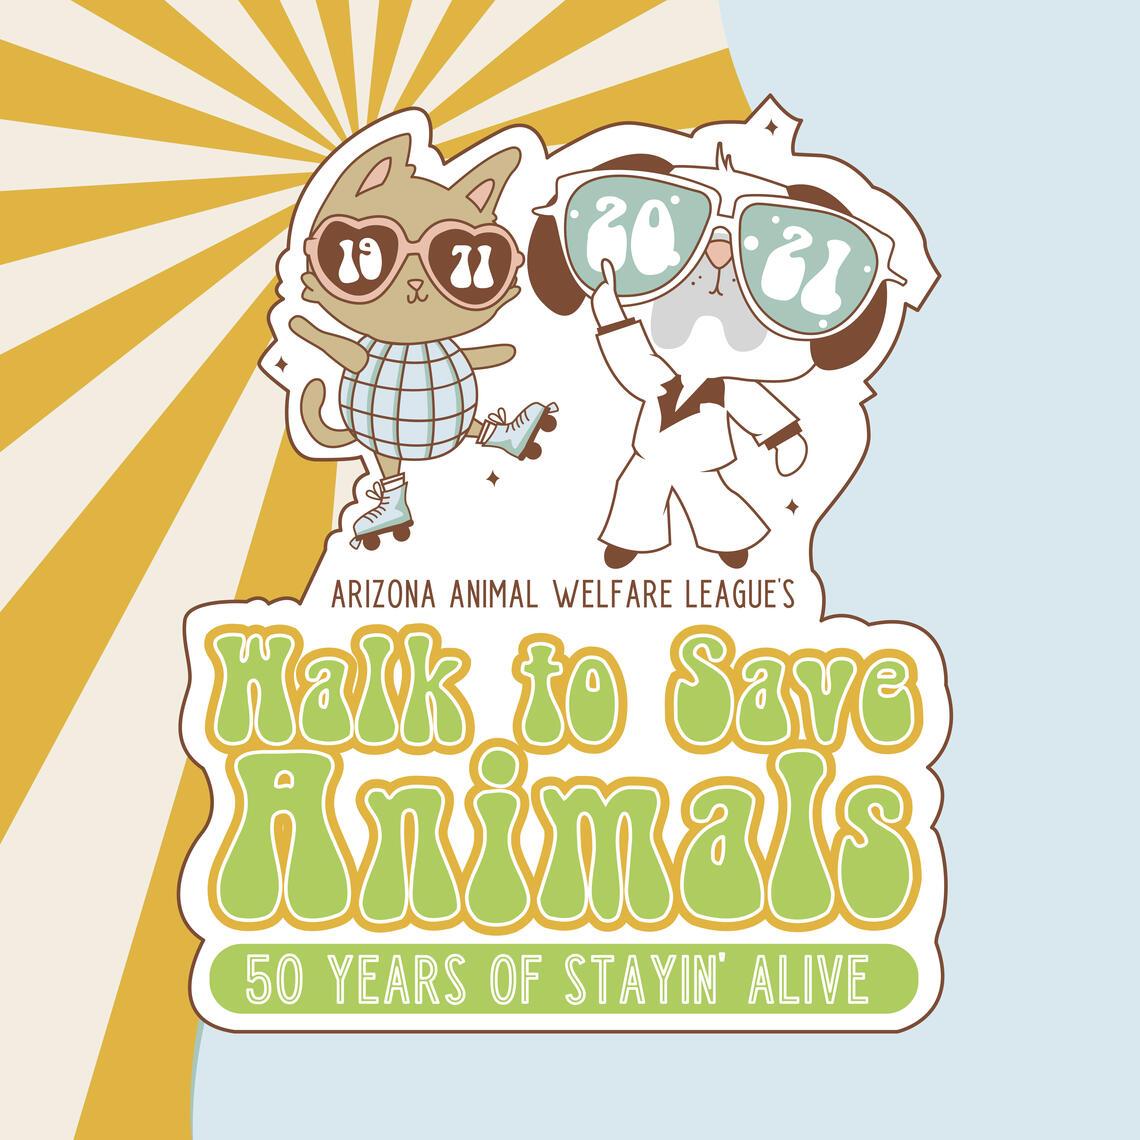 walk to save animals